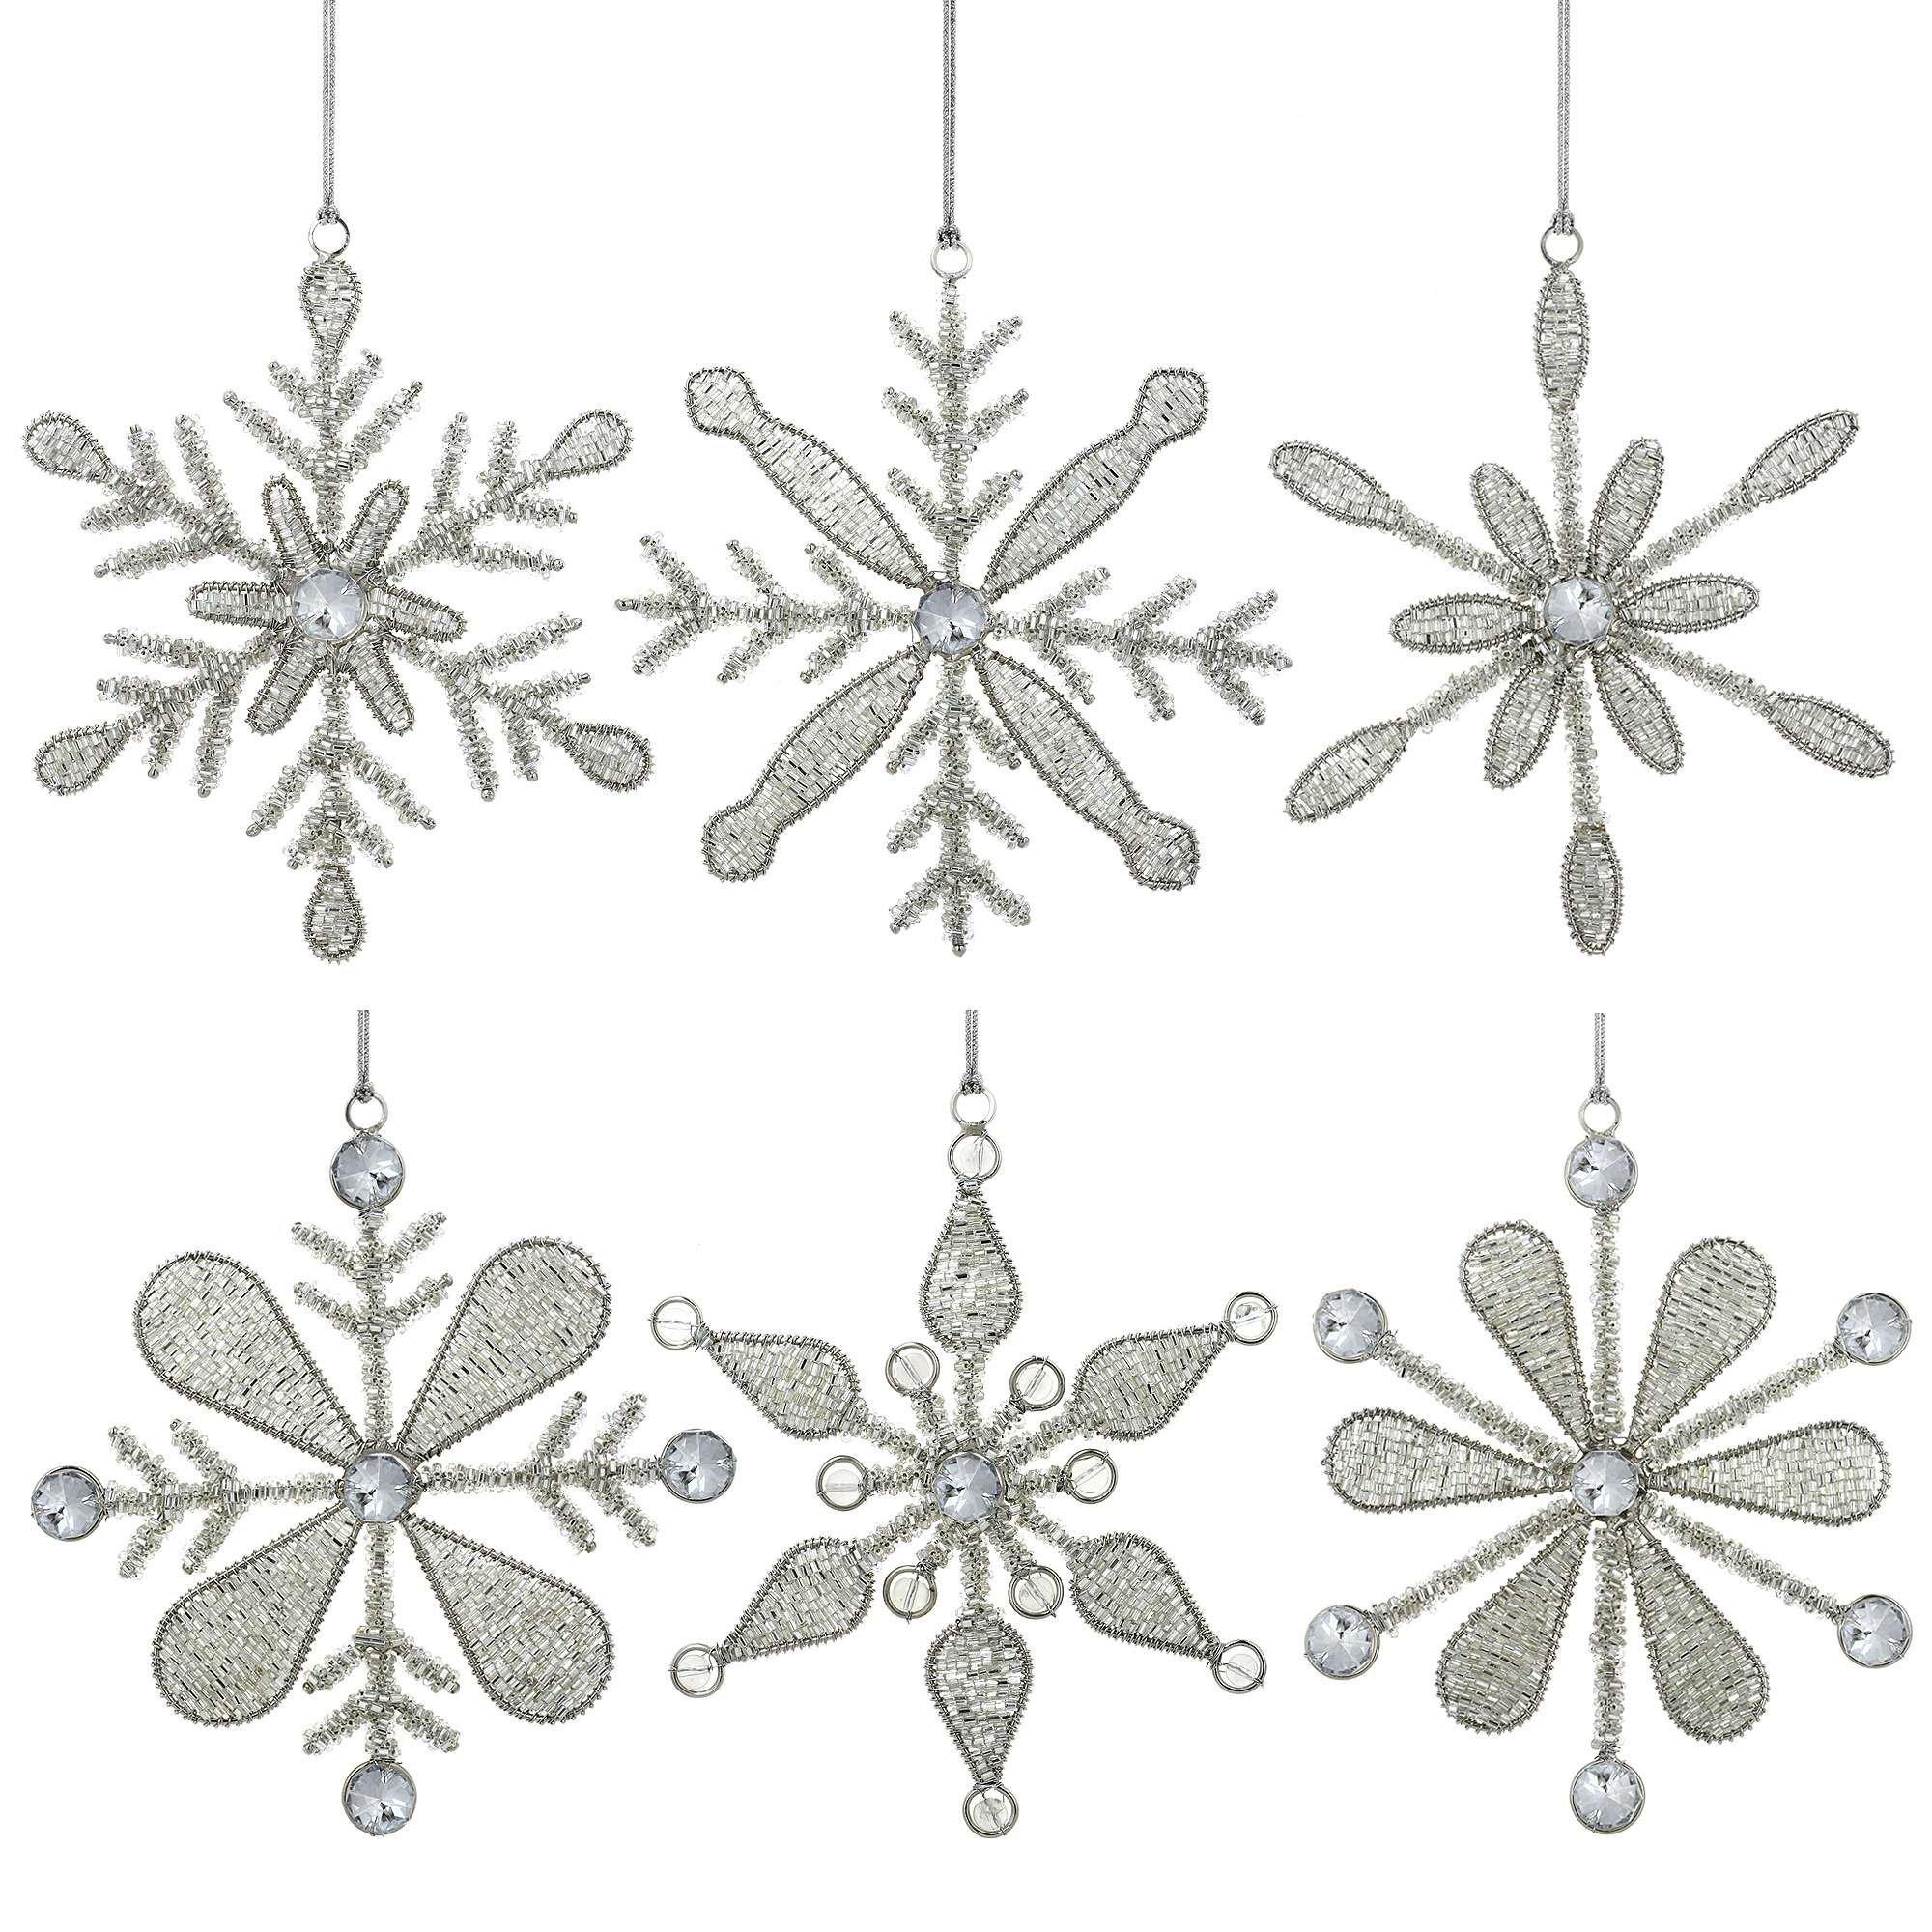 ShalinIndia Set of 6 Handmade Snowflake Iron and Glass Pendant Christmas Ornaments, 6 Inches